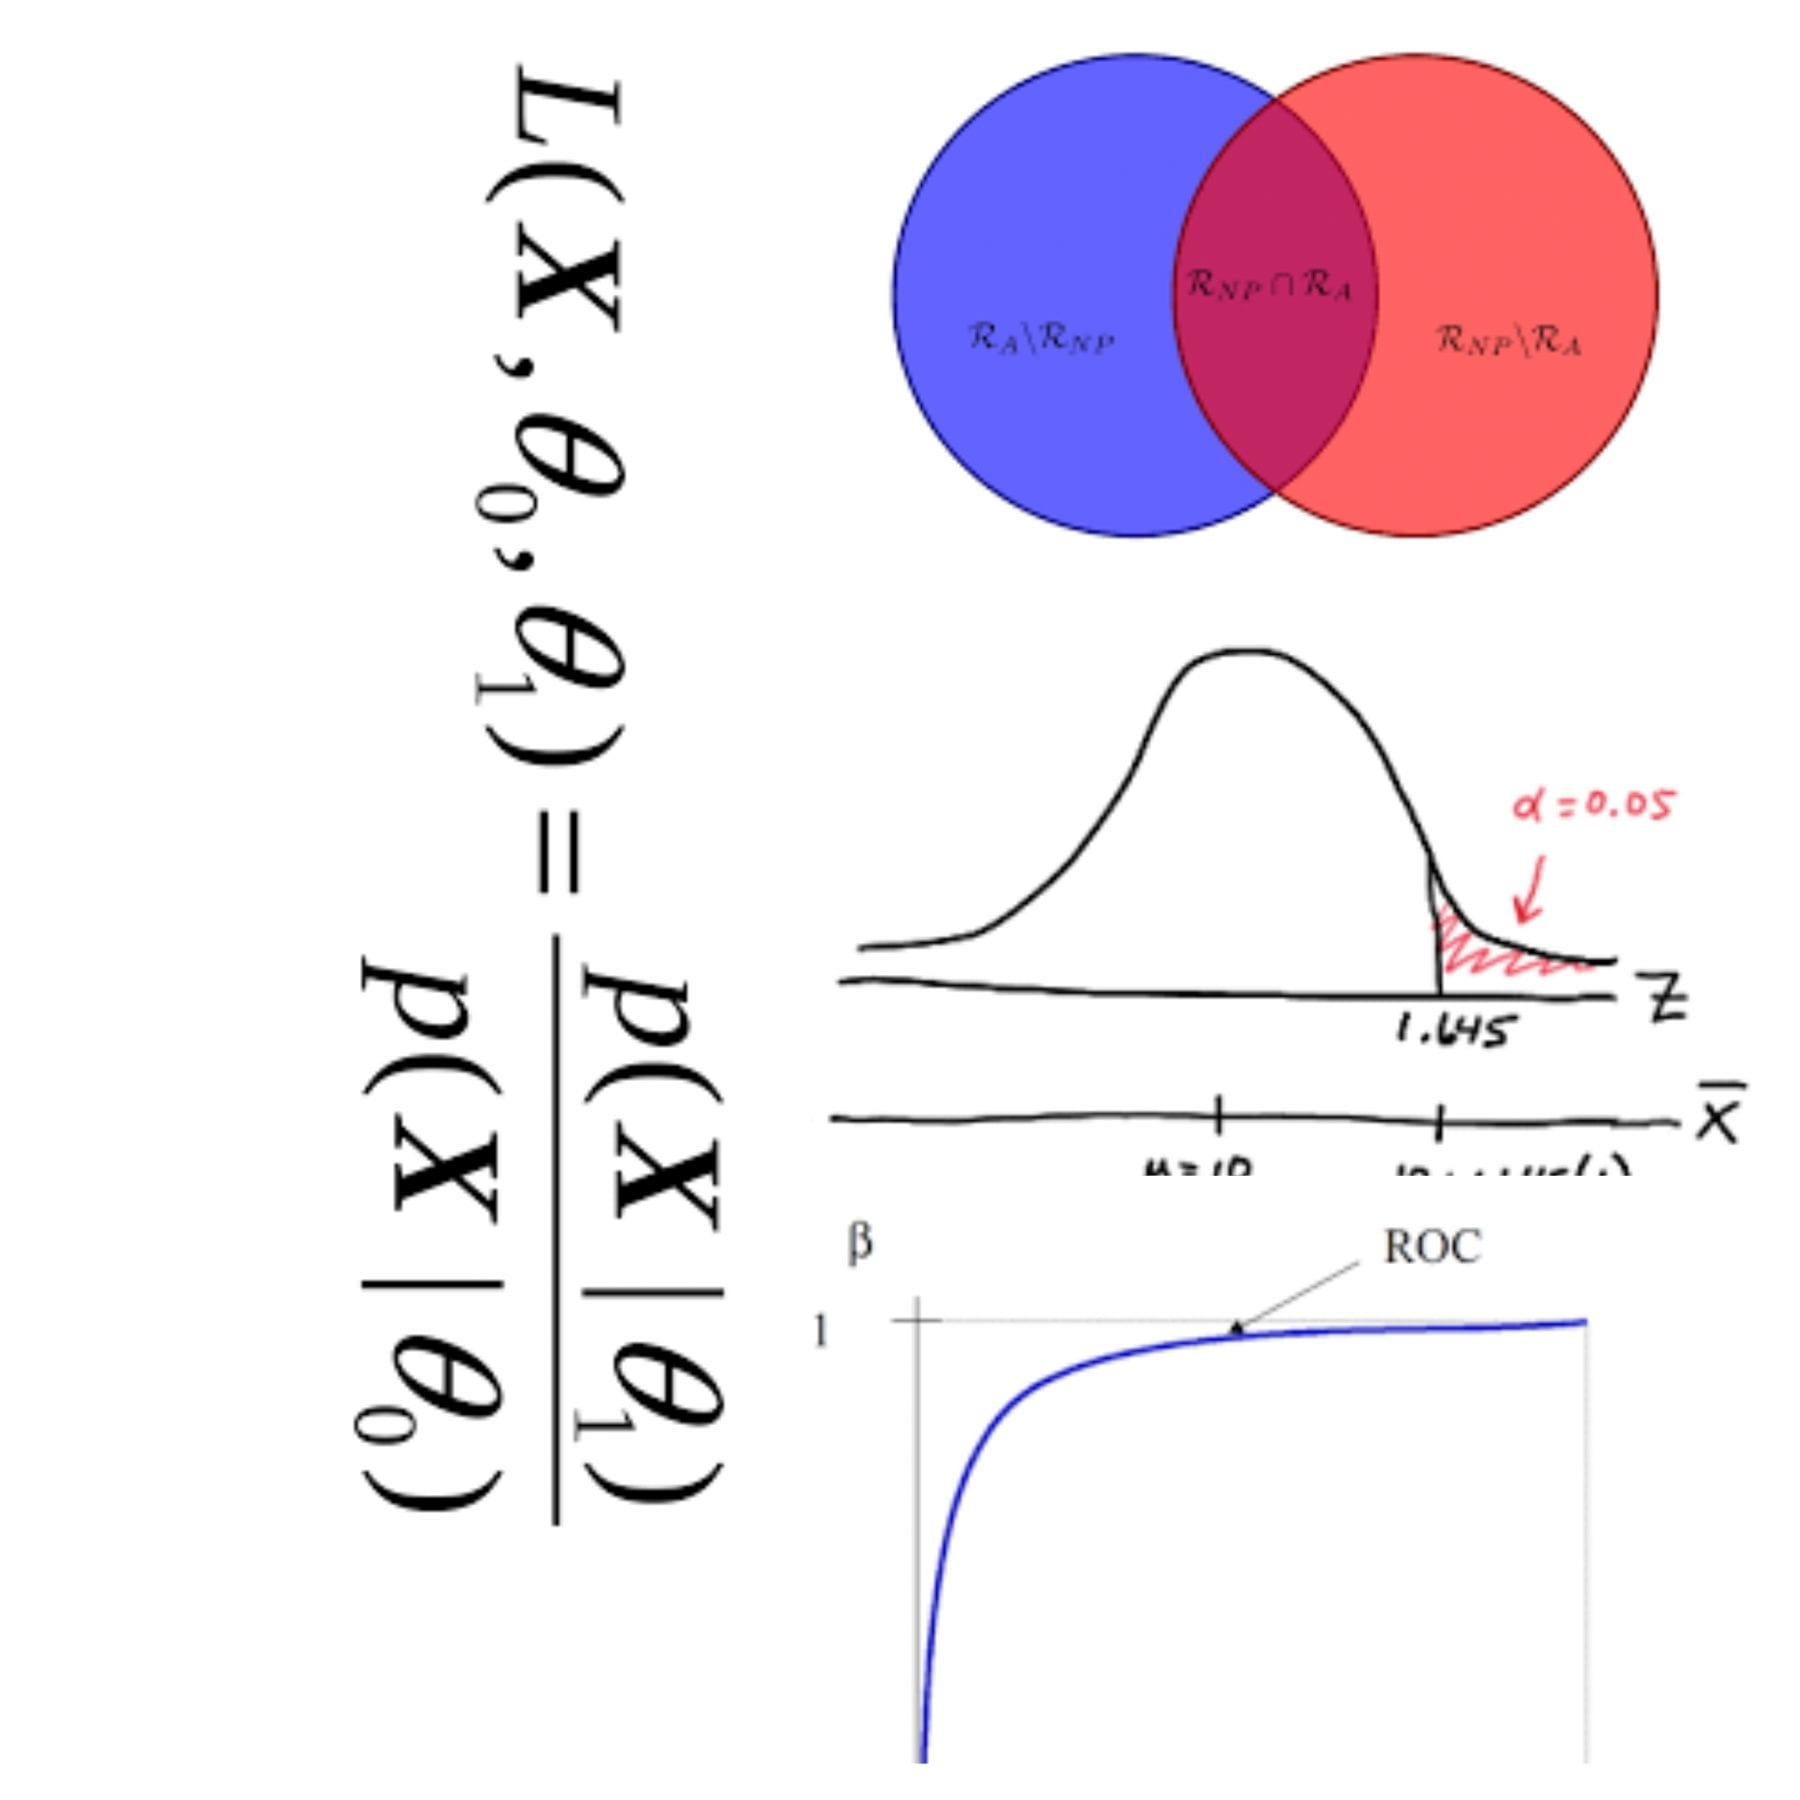 Neyman graph